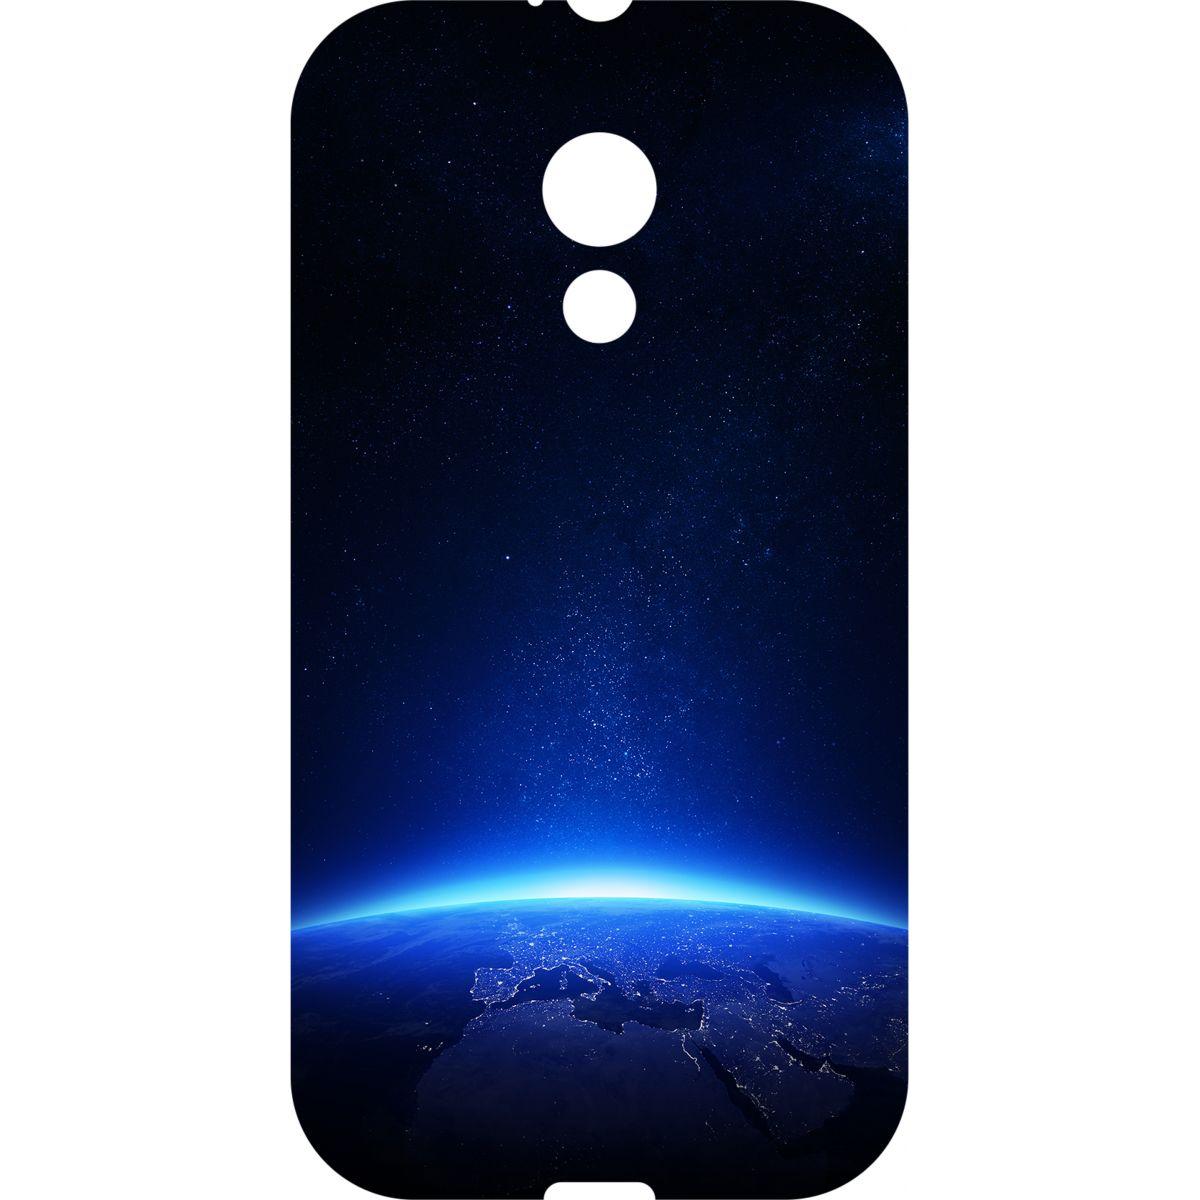 Capa Personalizada Exclusiva Motorola Moto G2 Xt1069 Xt1068 - HT20